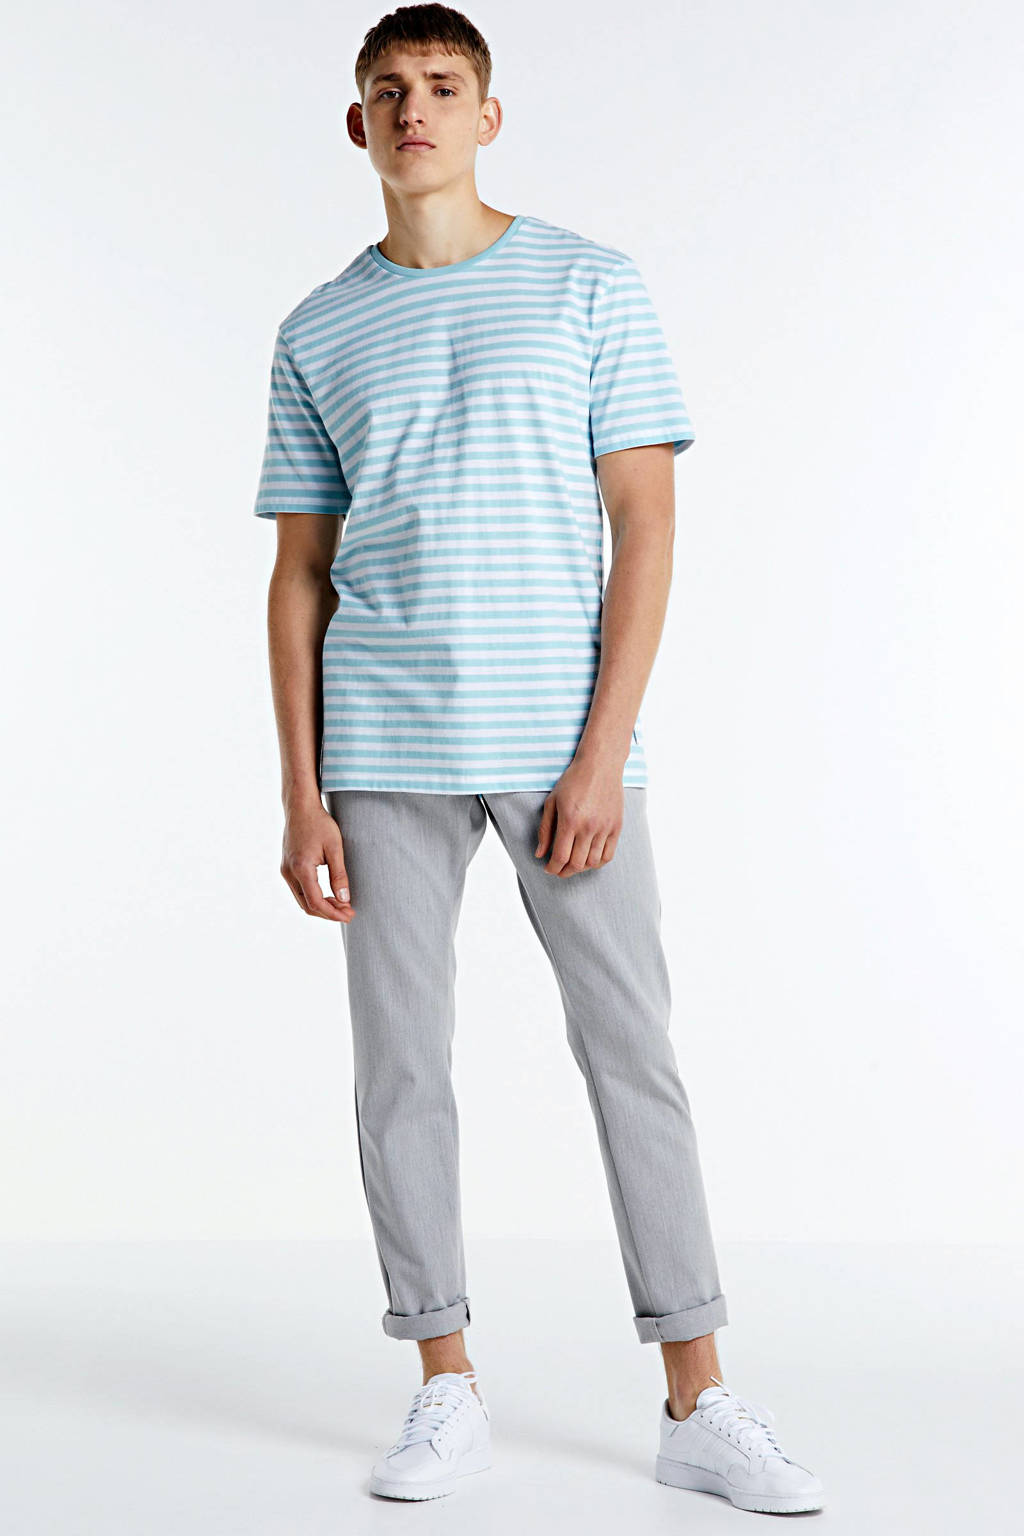 ONLY & SONS gestreept T-shirt Jamie van biologisch katoen lichtblauw/wit, Lichtblauw/wit